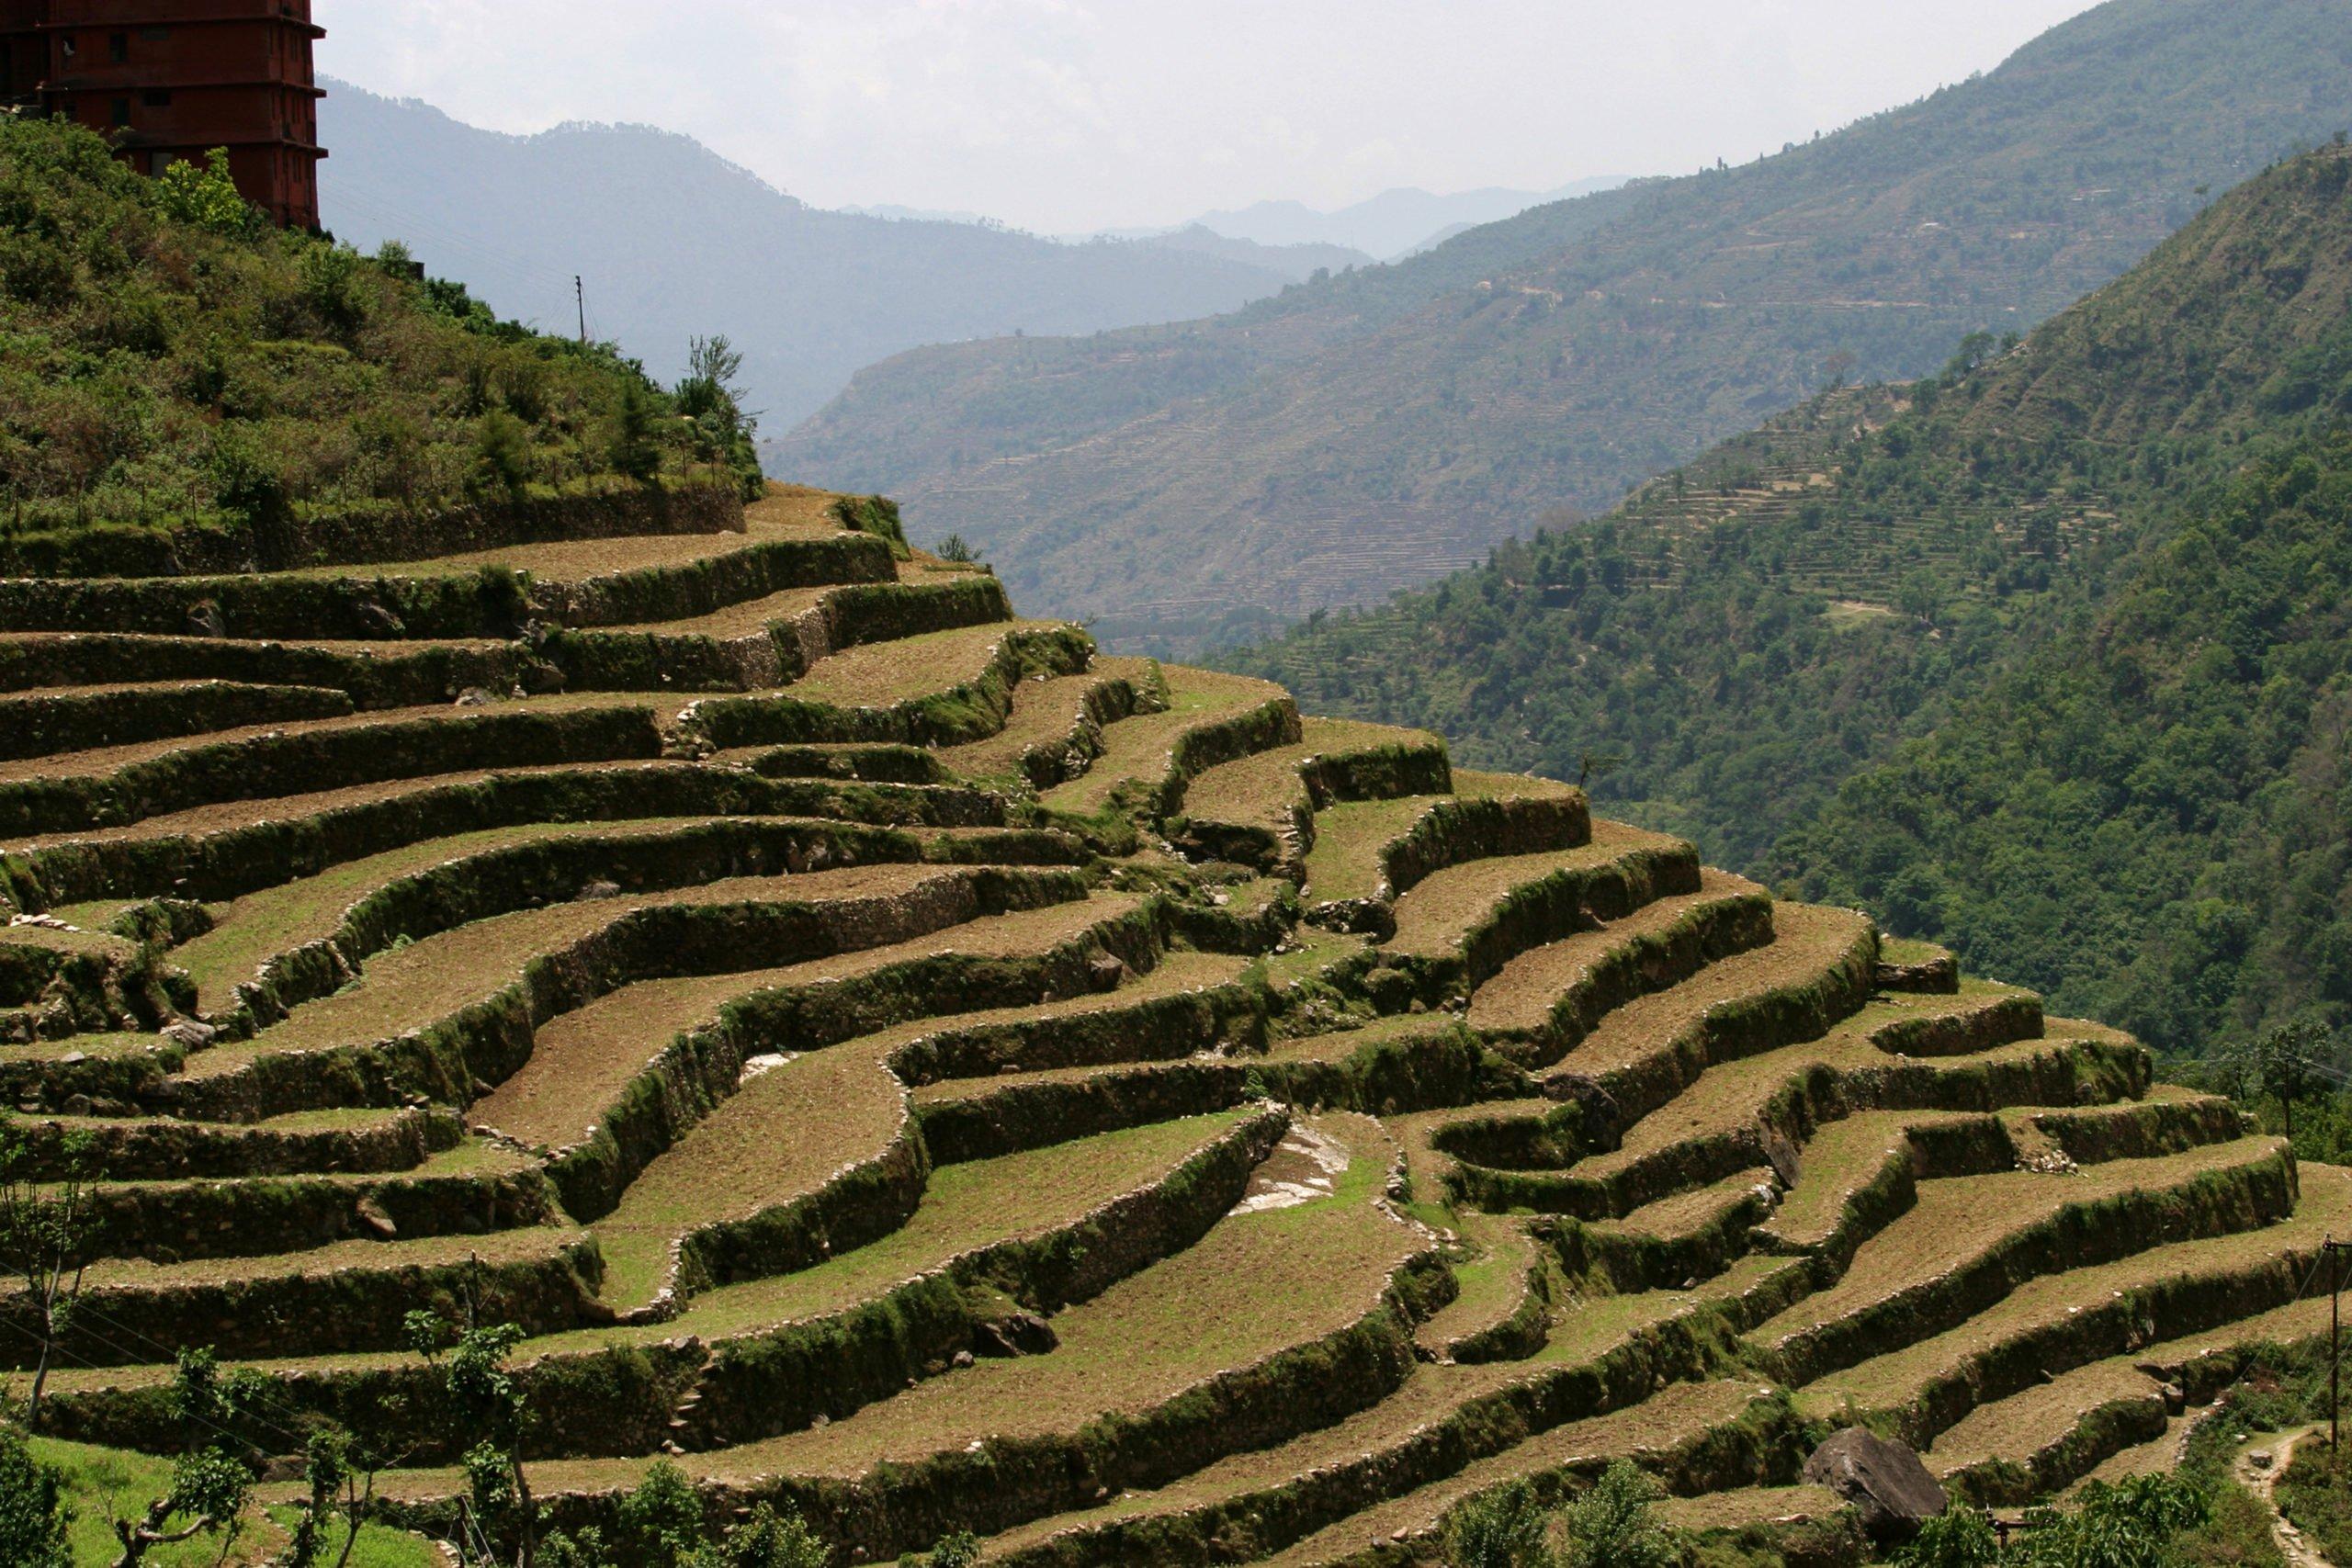 Terrace farming in Uttarakhand, Aroon Thaewchatturat